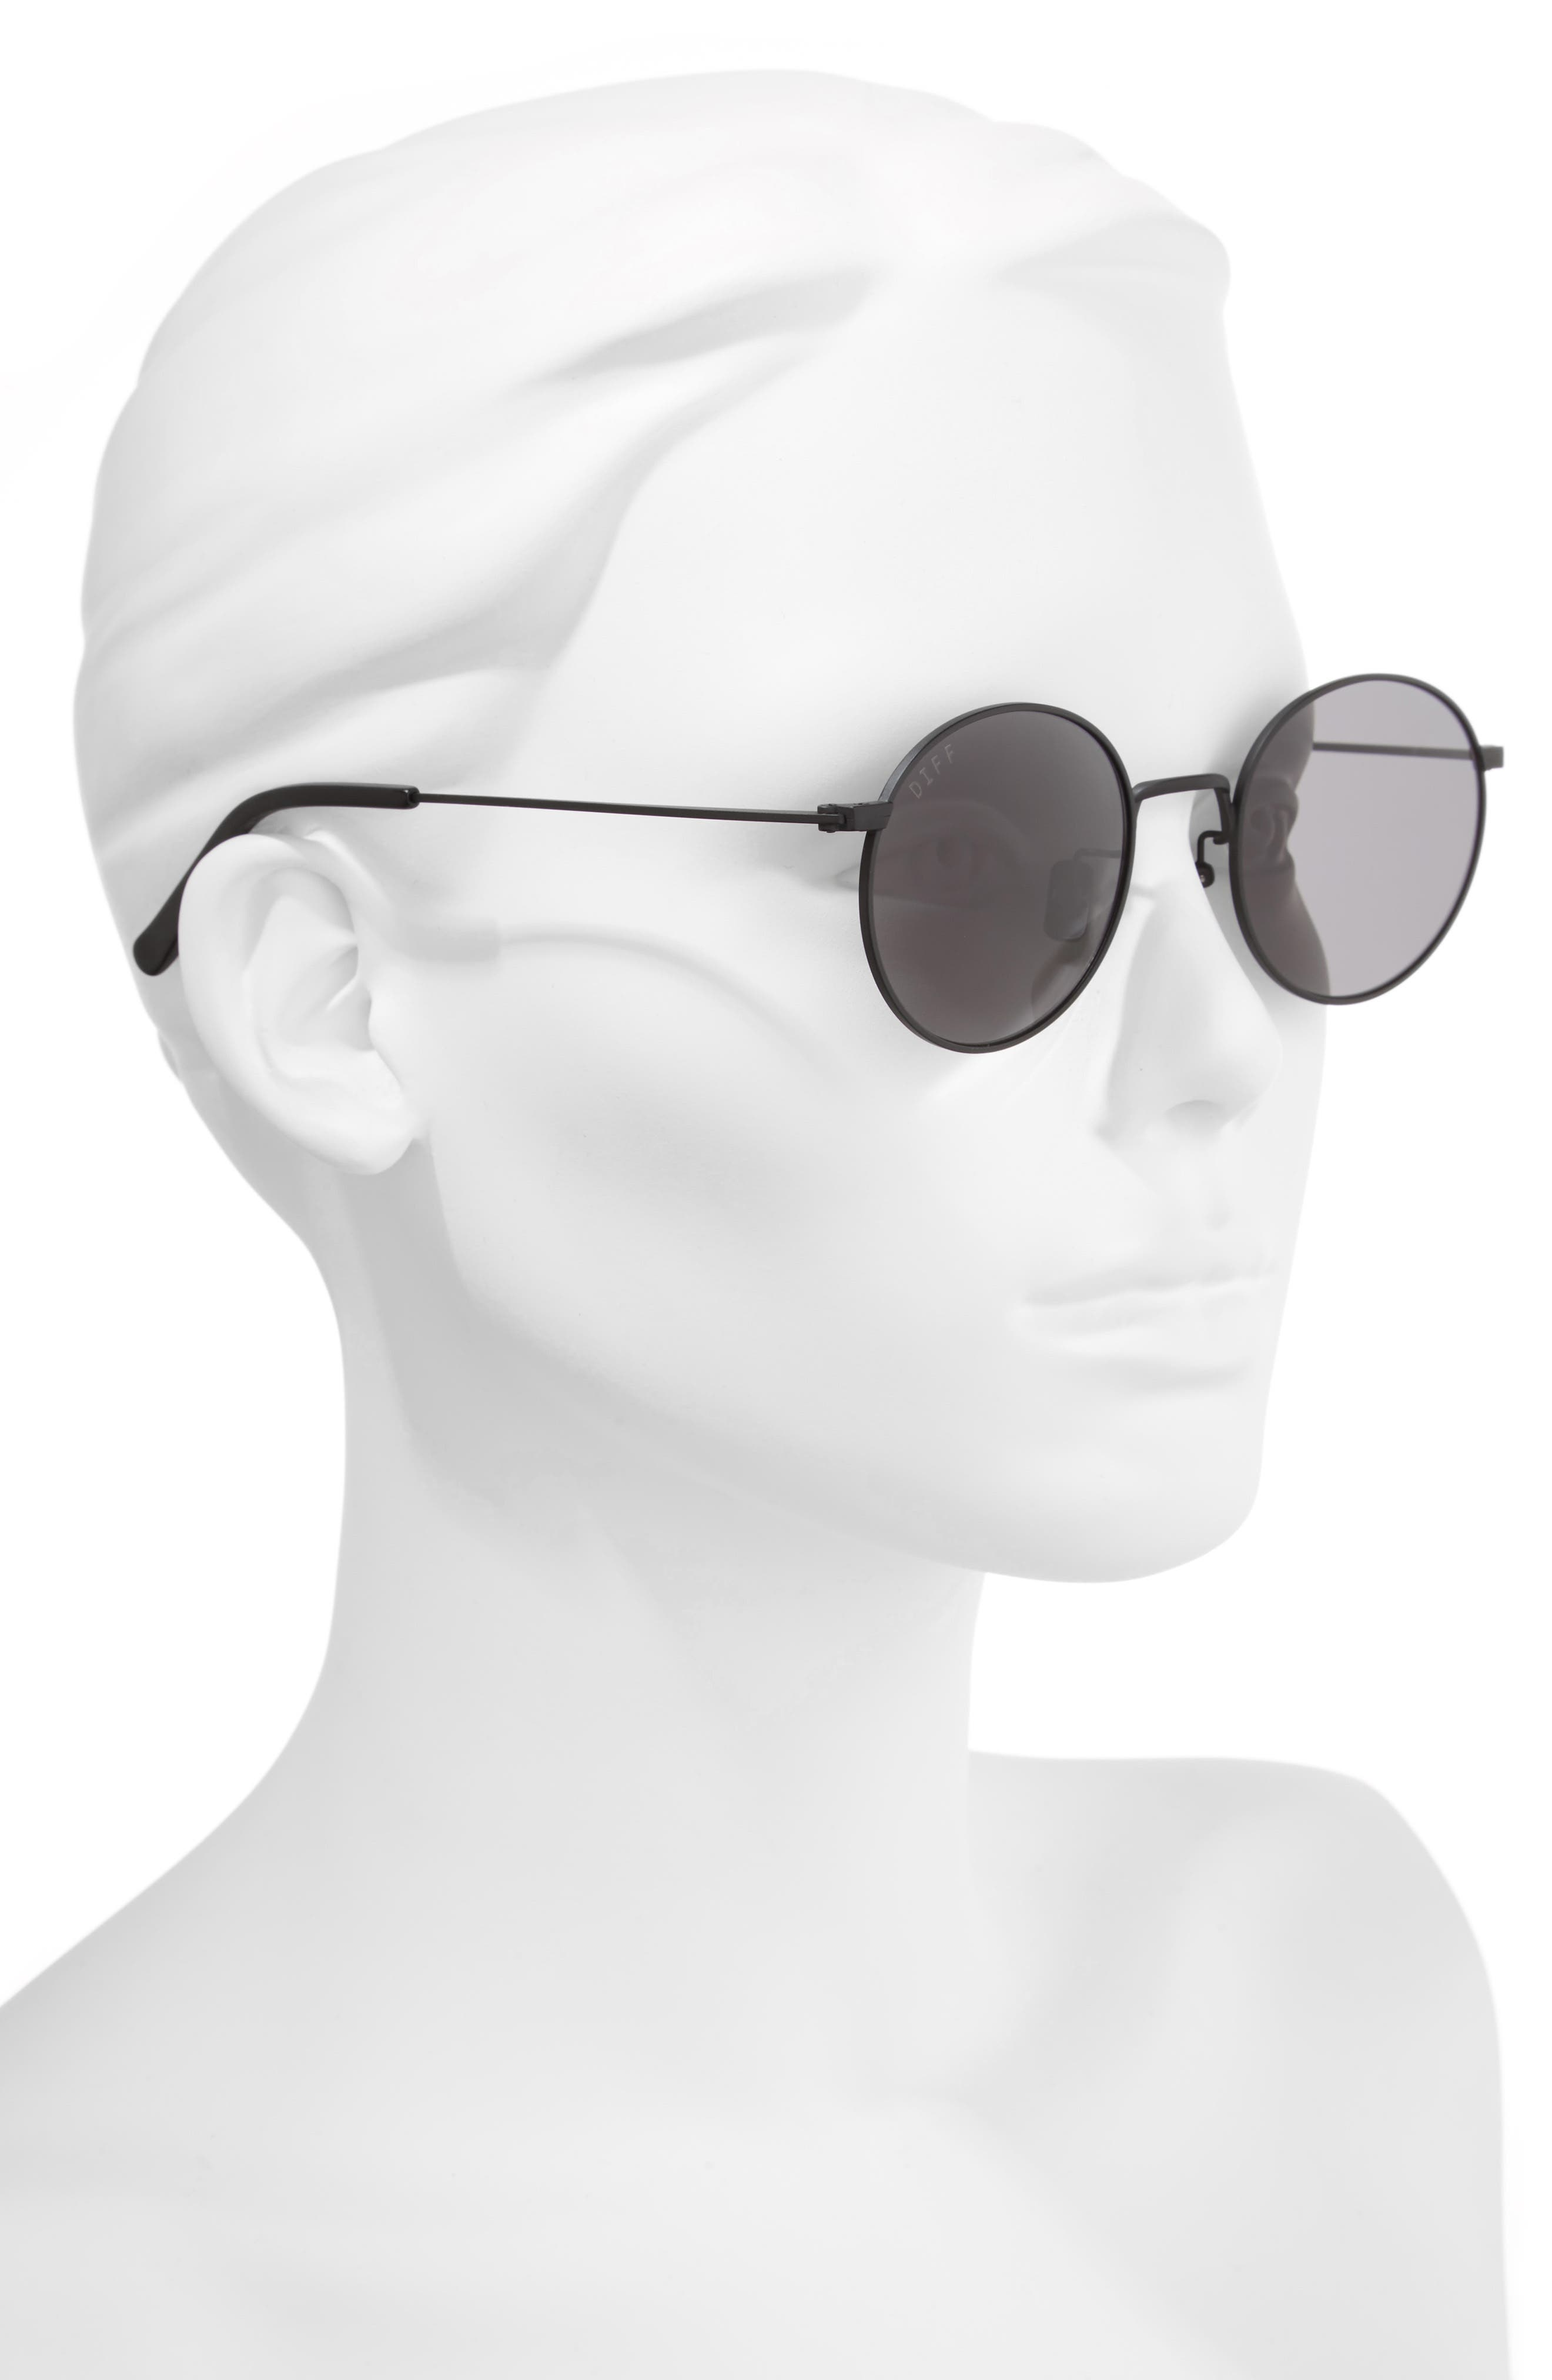 Daisy 51mm Round Sunglasses,                             Alternate thumbnail 2, color,                             Matte Black/ Grey